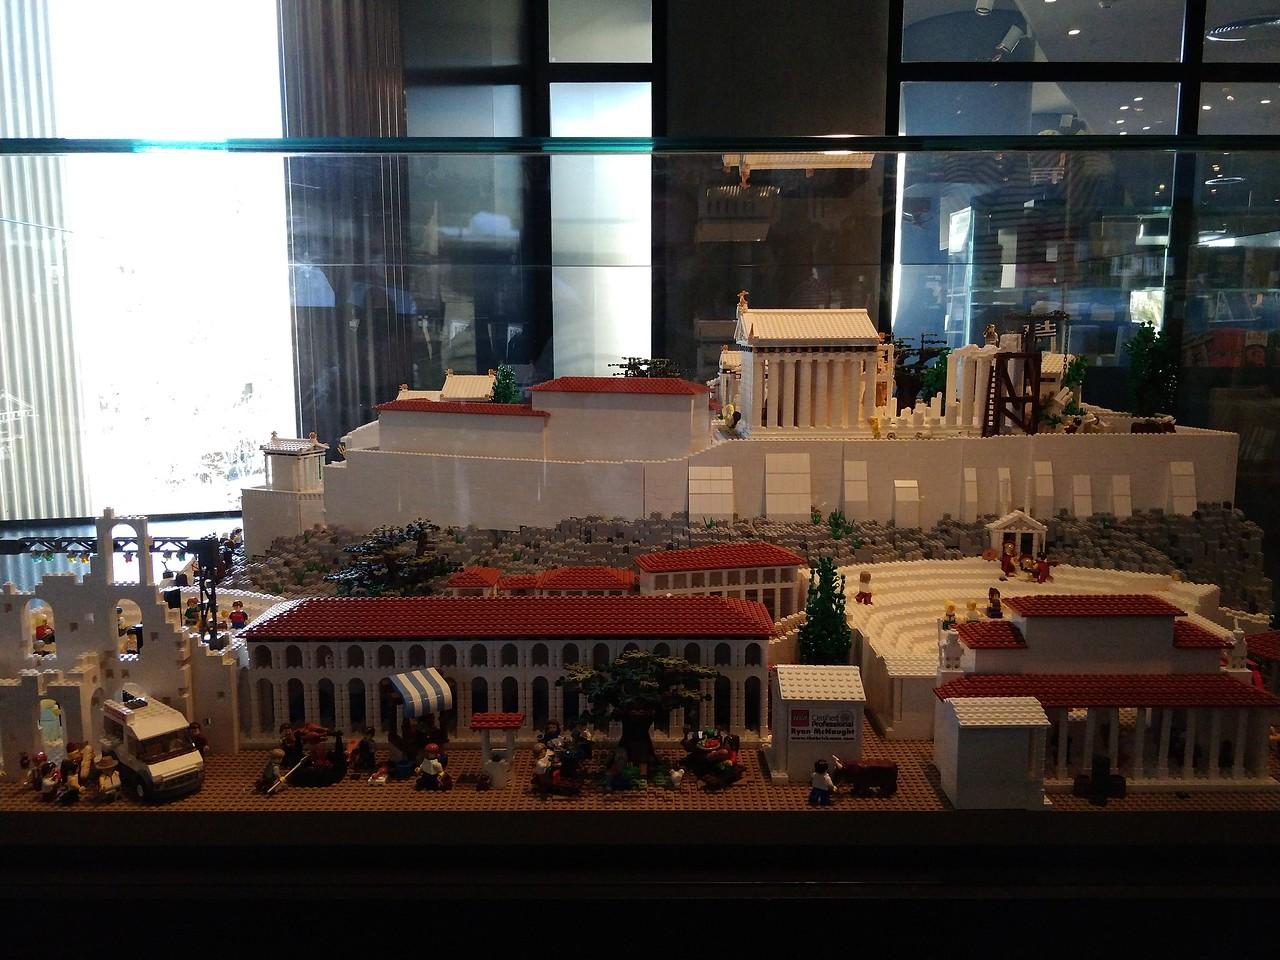 060 - Acropolis Museum - The Acropolis in Lego Form